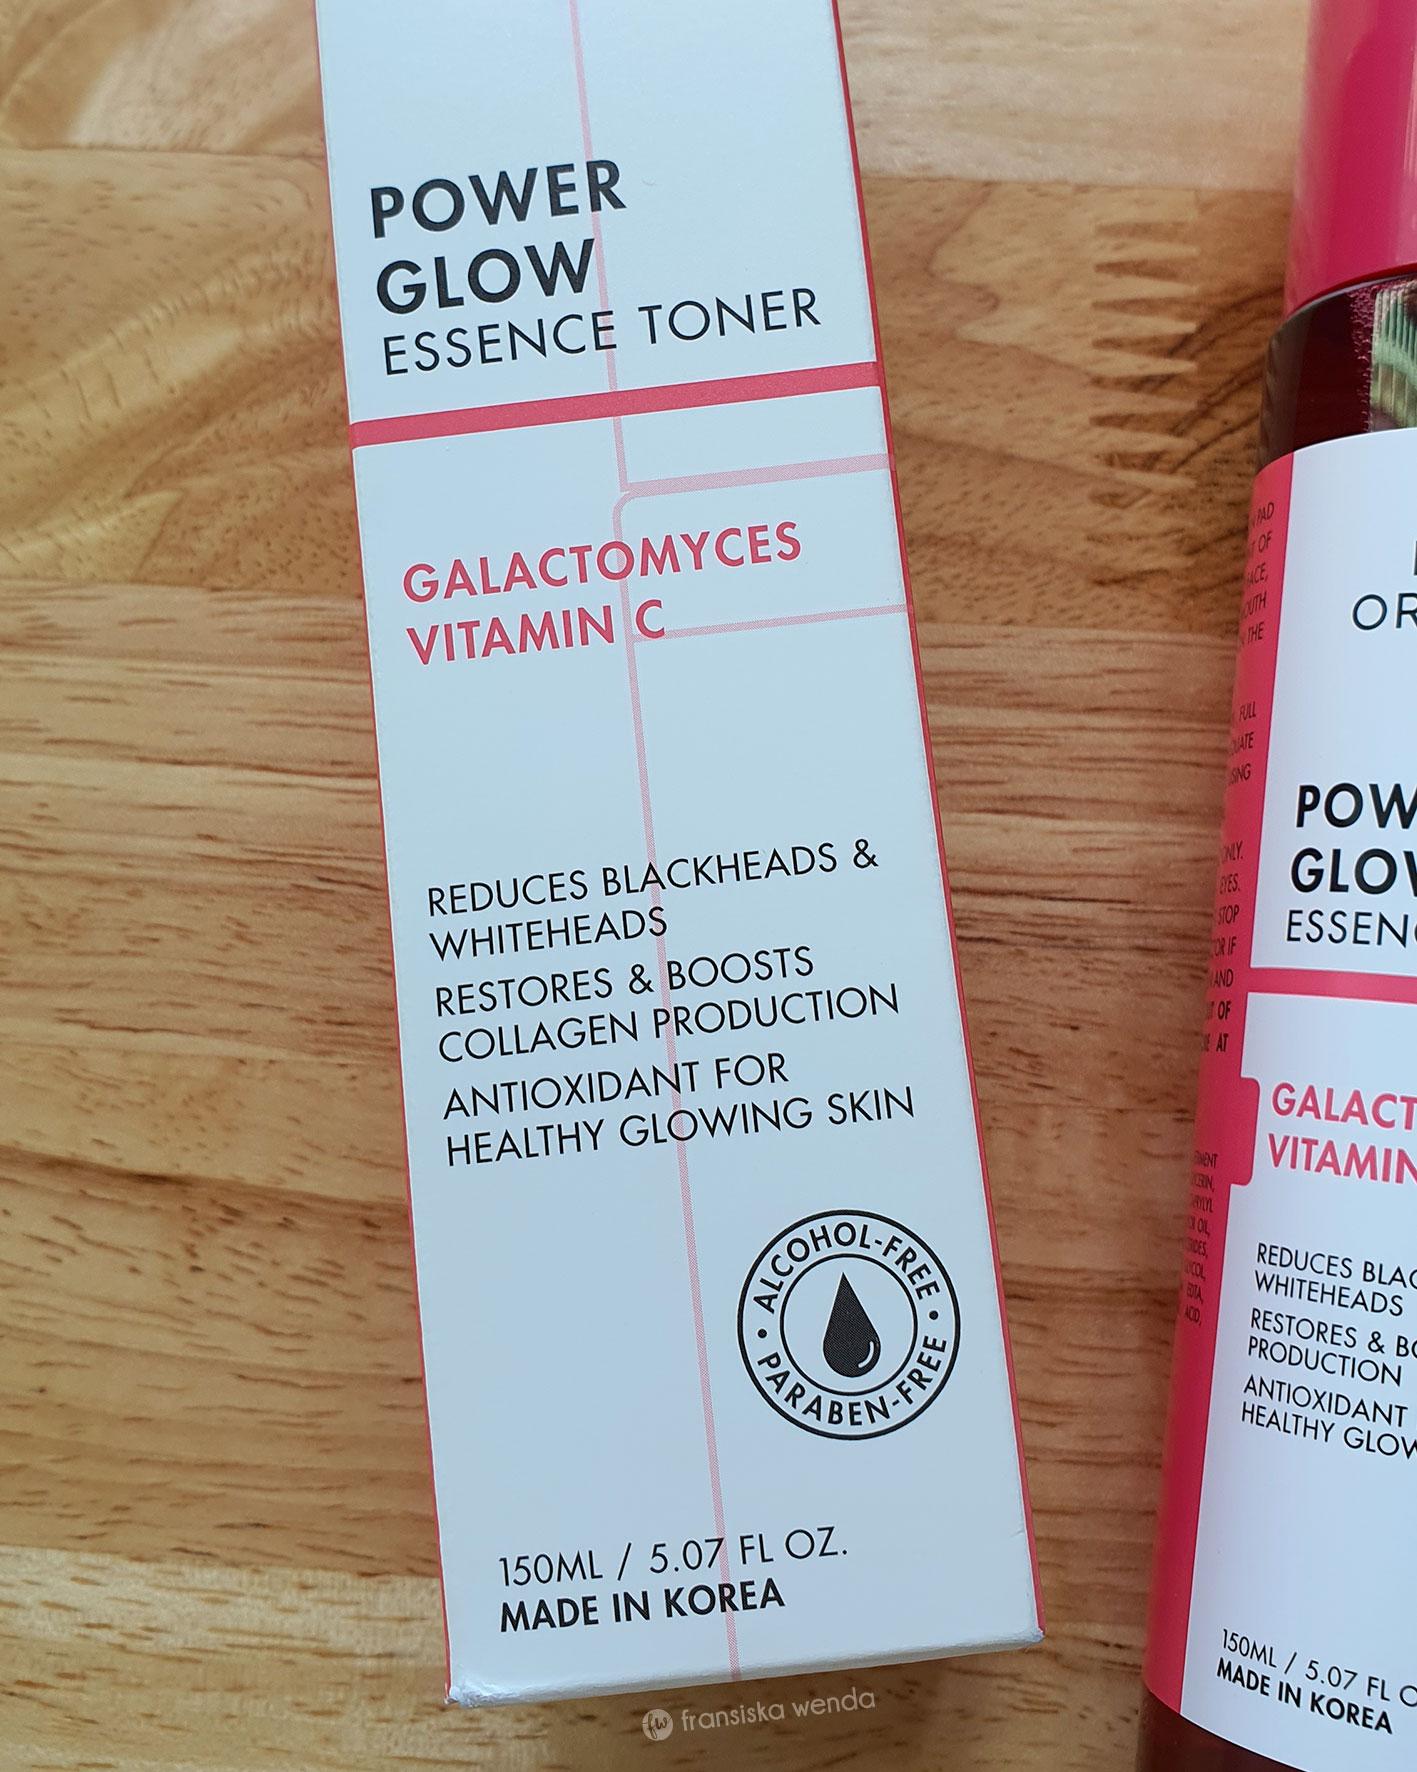 Get glowing skin with Luxe Organix Power Glow Essence Toner - Review - fransiska wenda